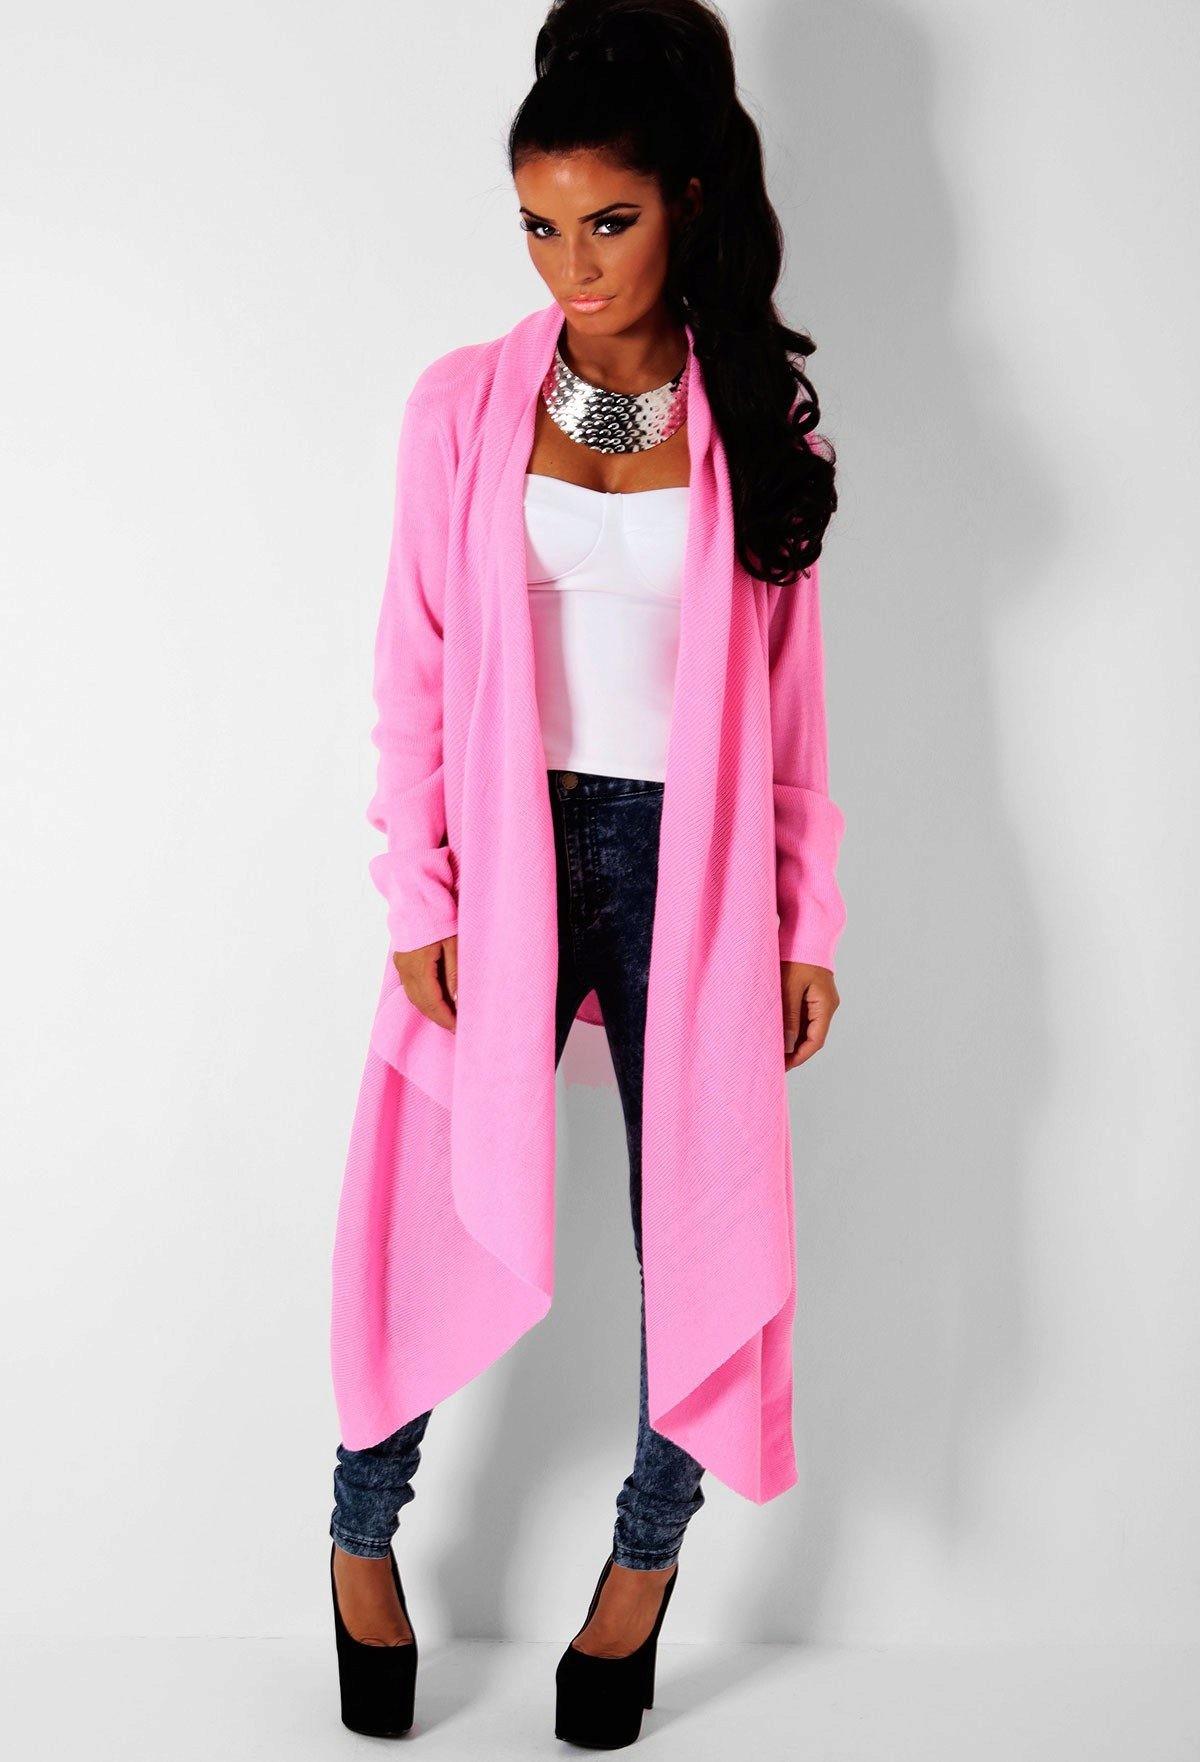 модные женские кардиганы 2018: кардиган розовый длинный